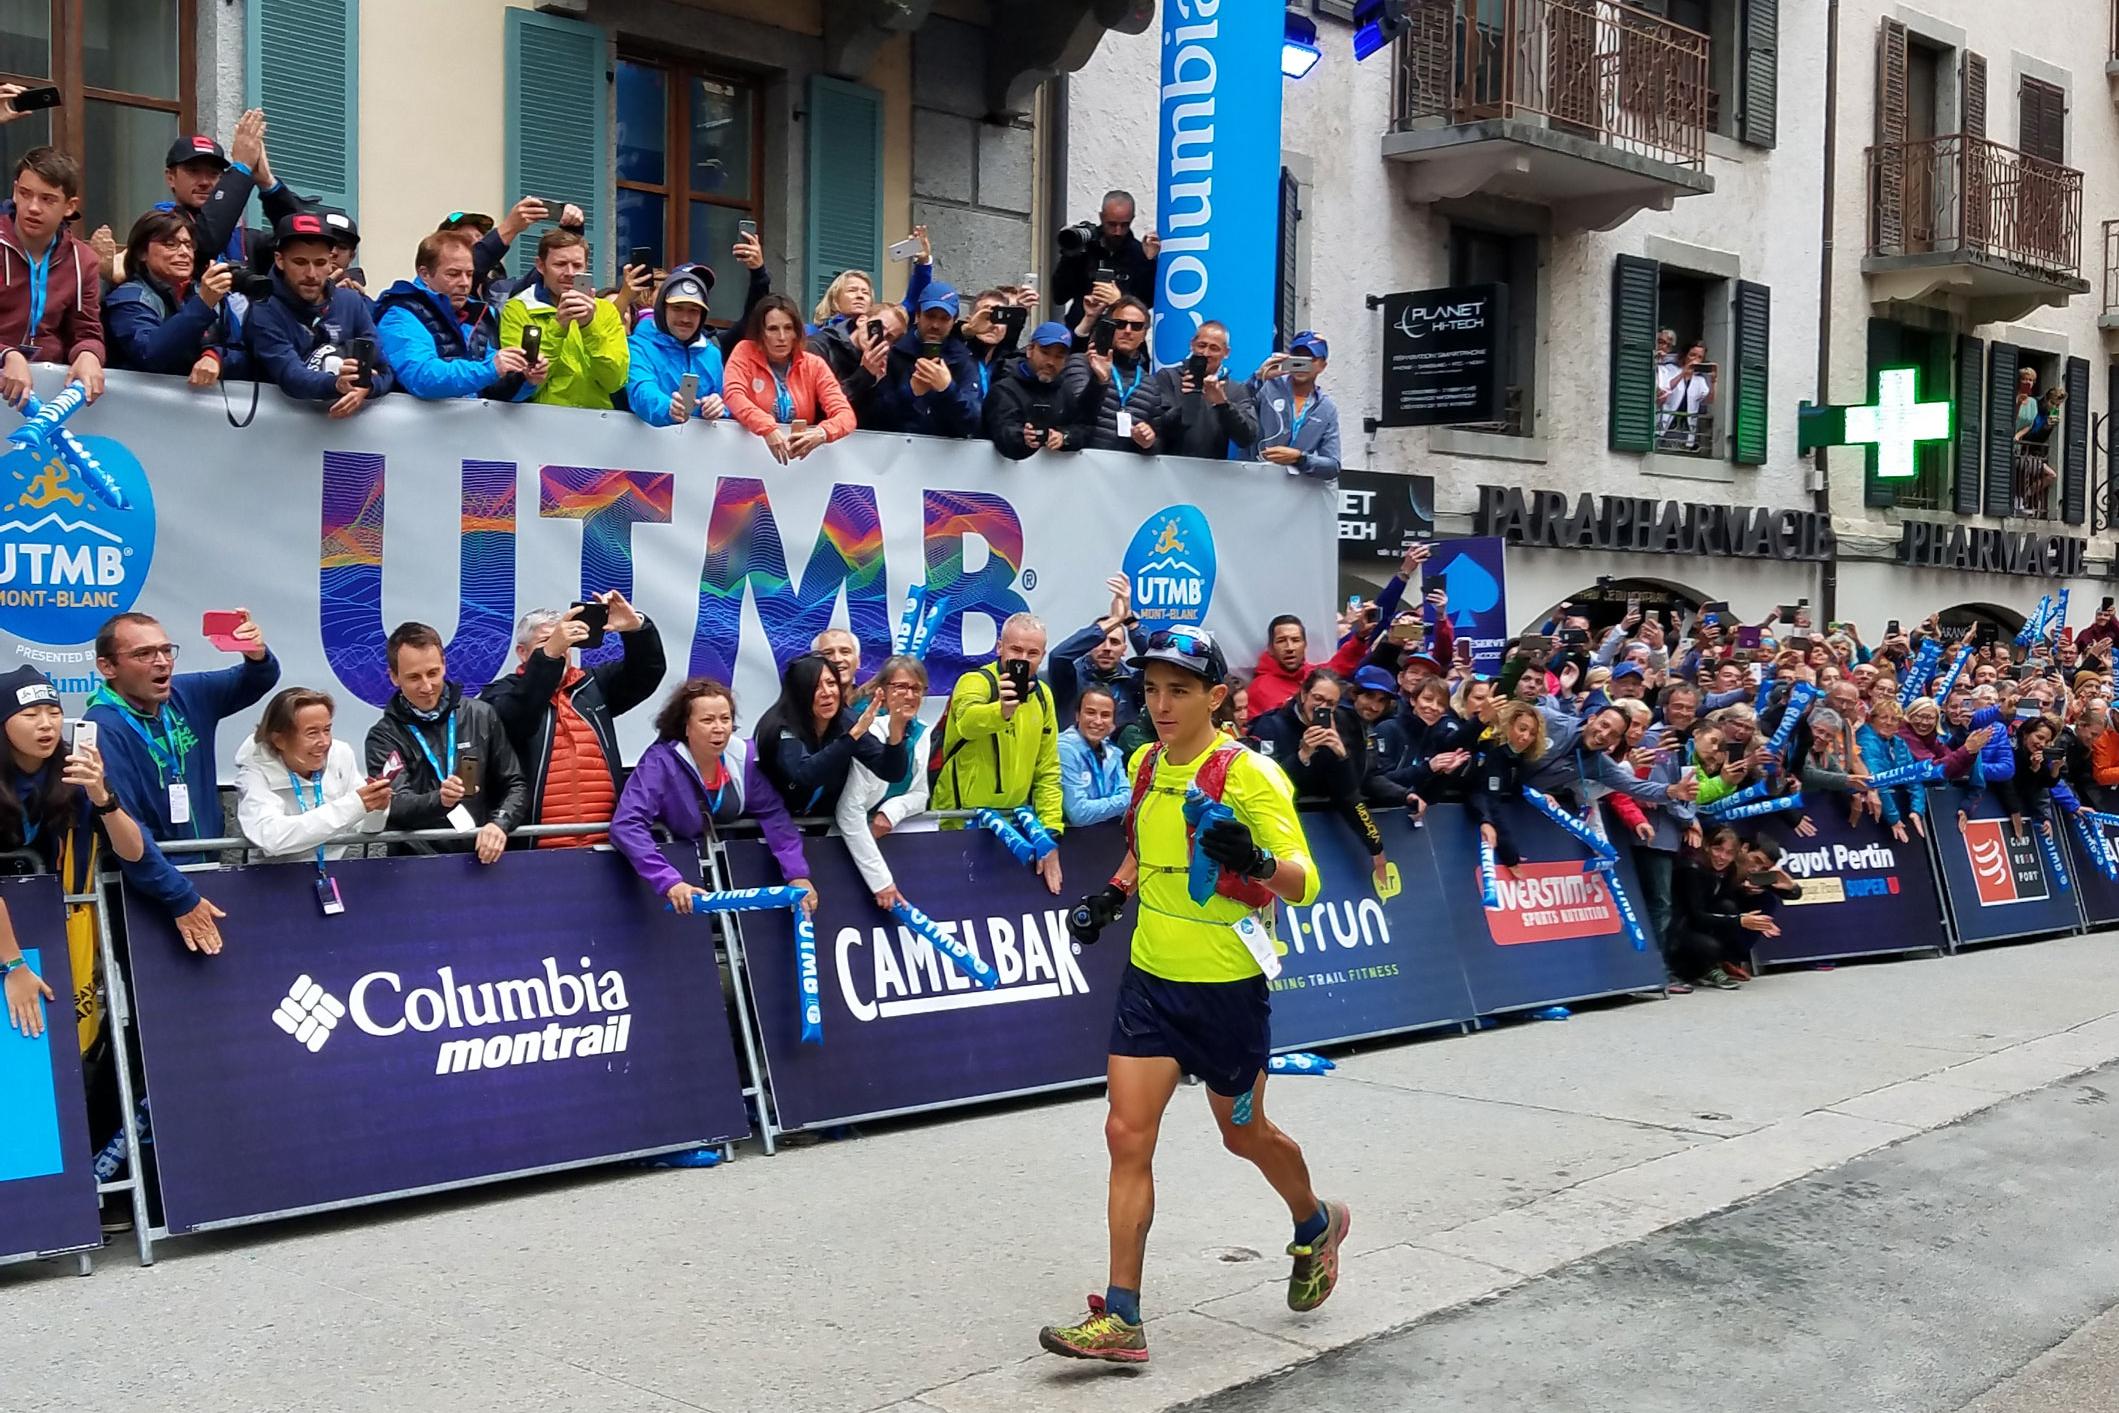 Thévenard Canepa Prevail At Wild Ultra Trail Du Mont Blanc Race Gearjunkie